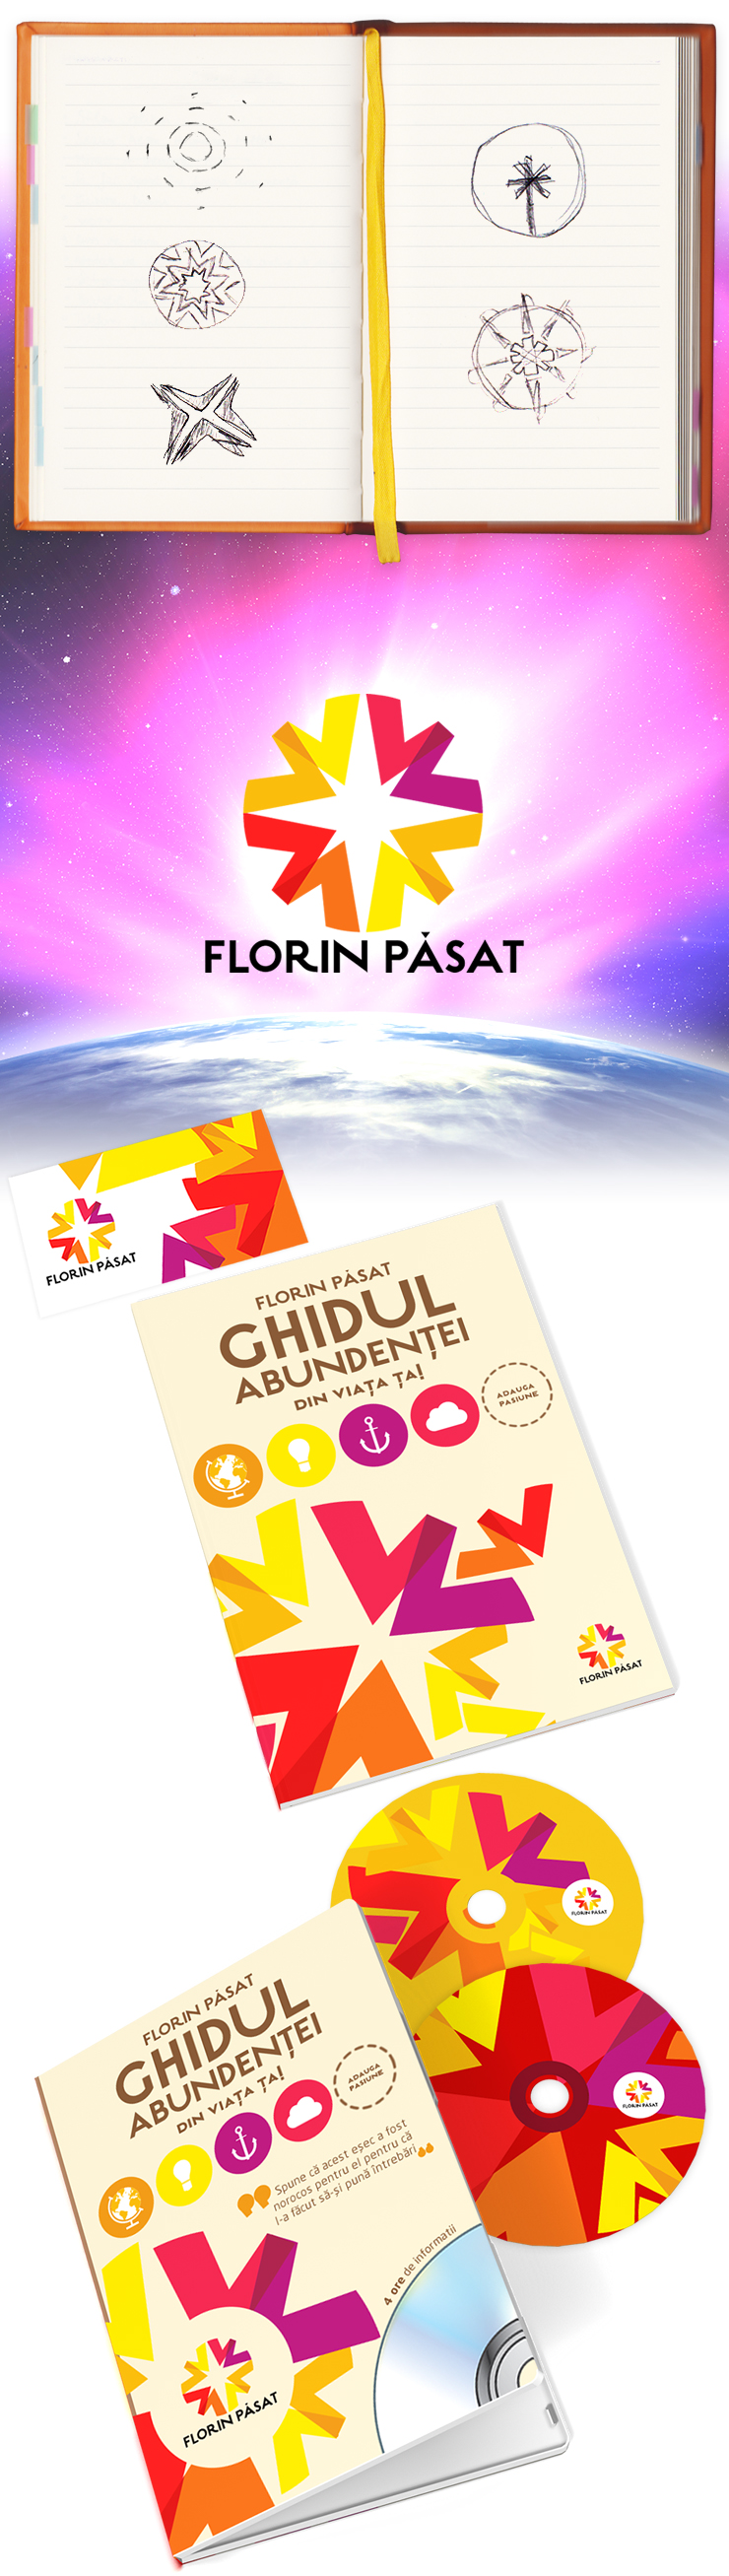 Florin Pasat - Branding